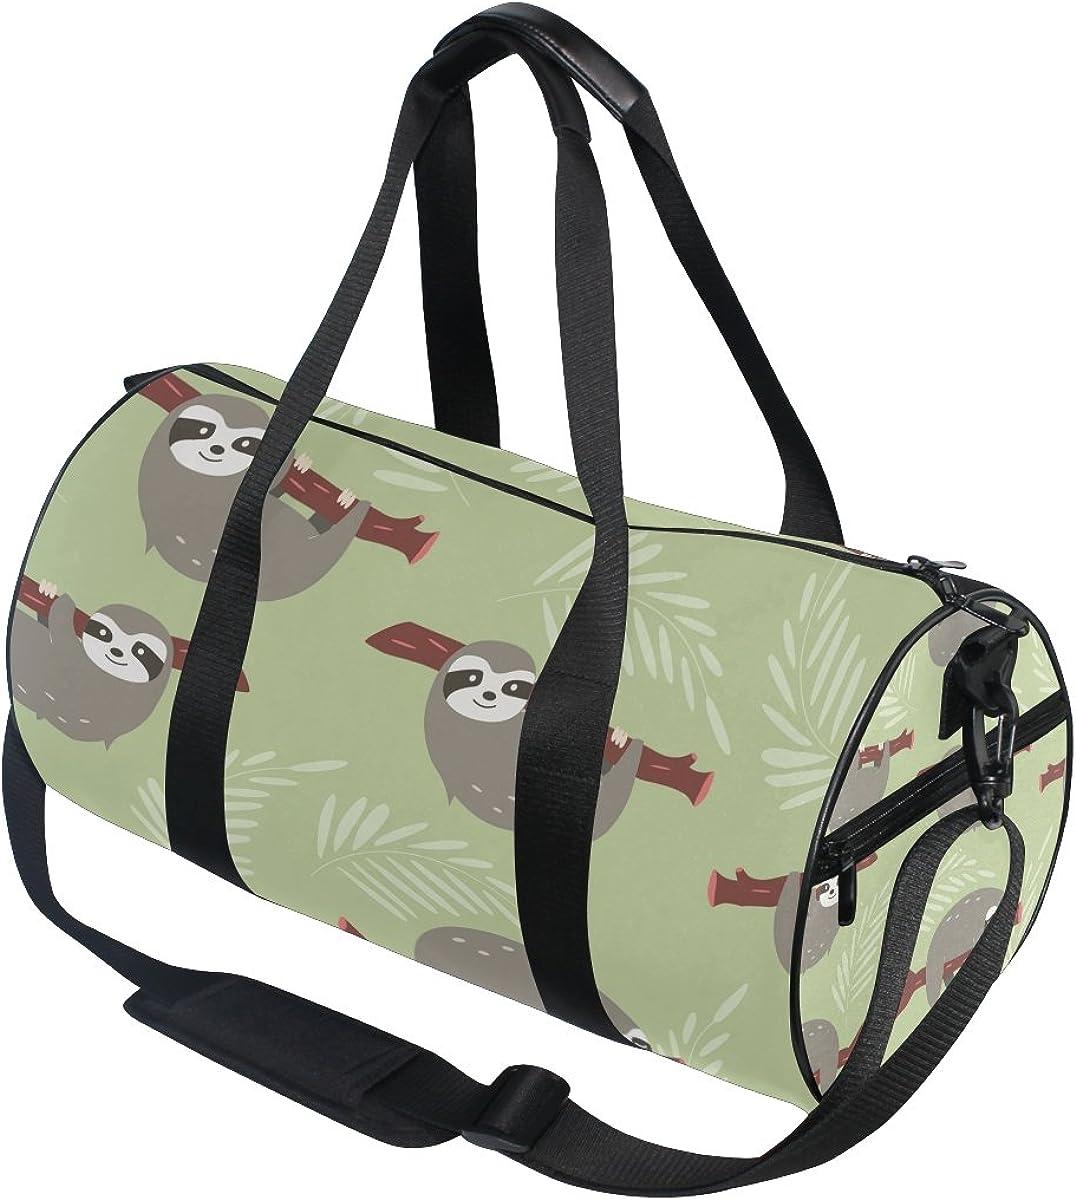 Evolutions Yoga Sloth Travel Duffel Bag Sports Gym Bag For Men